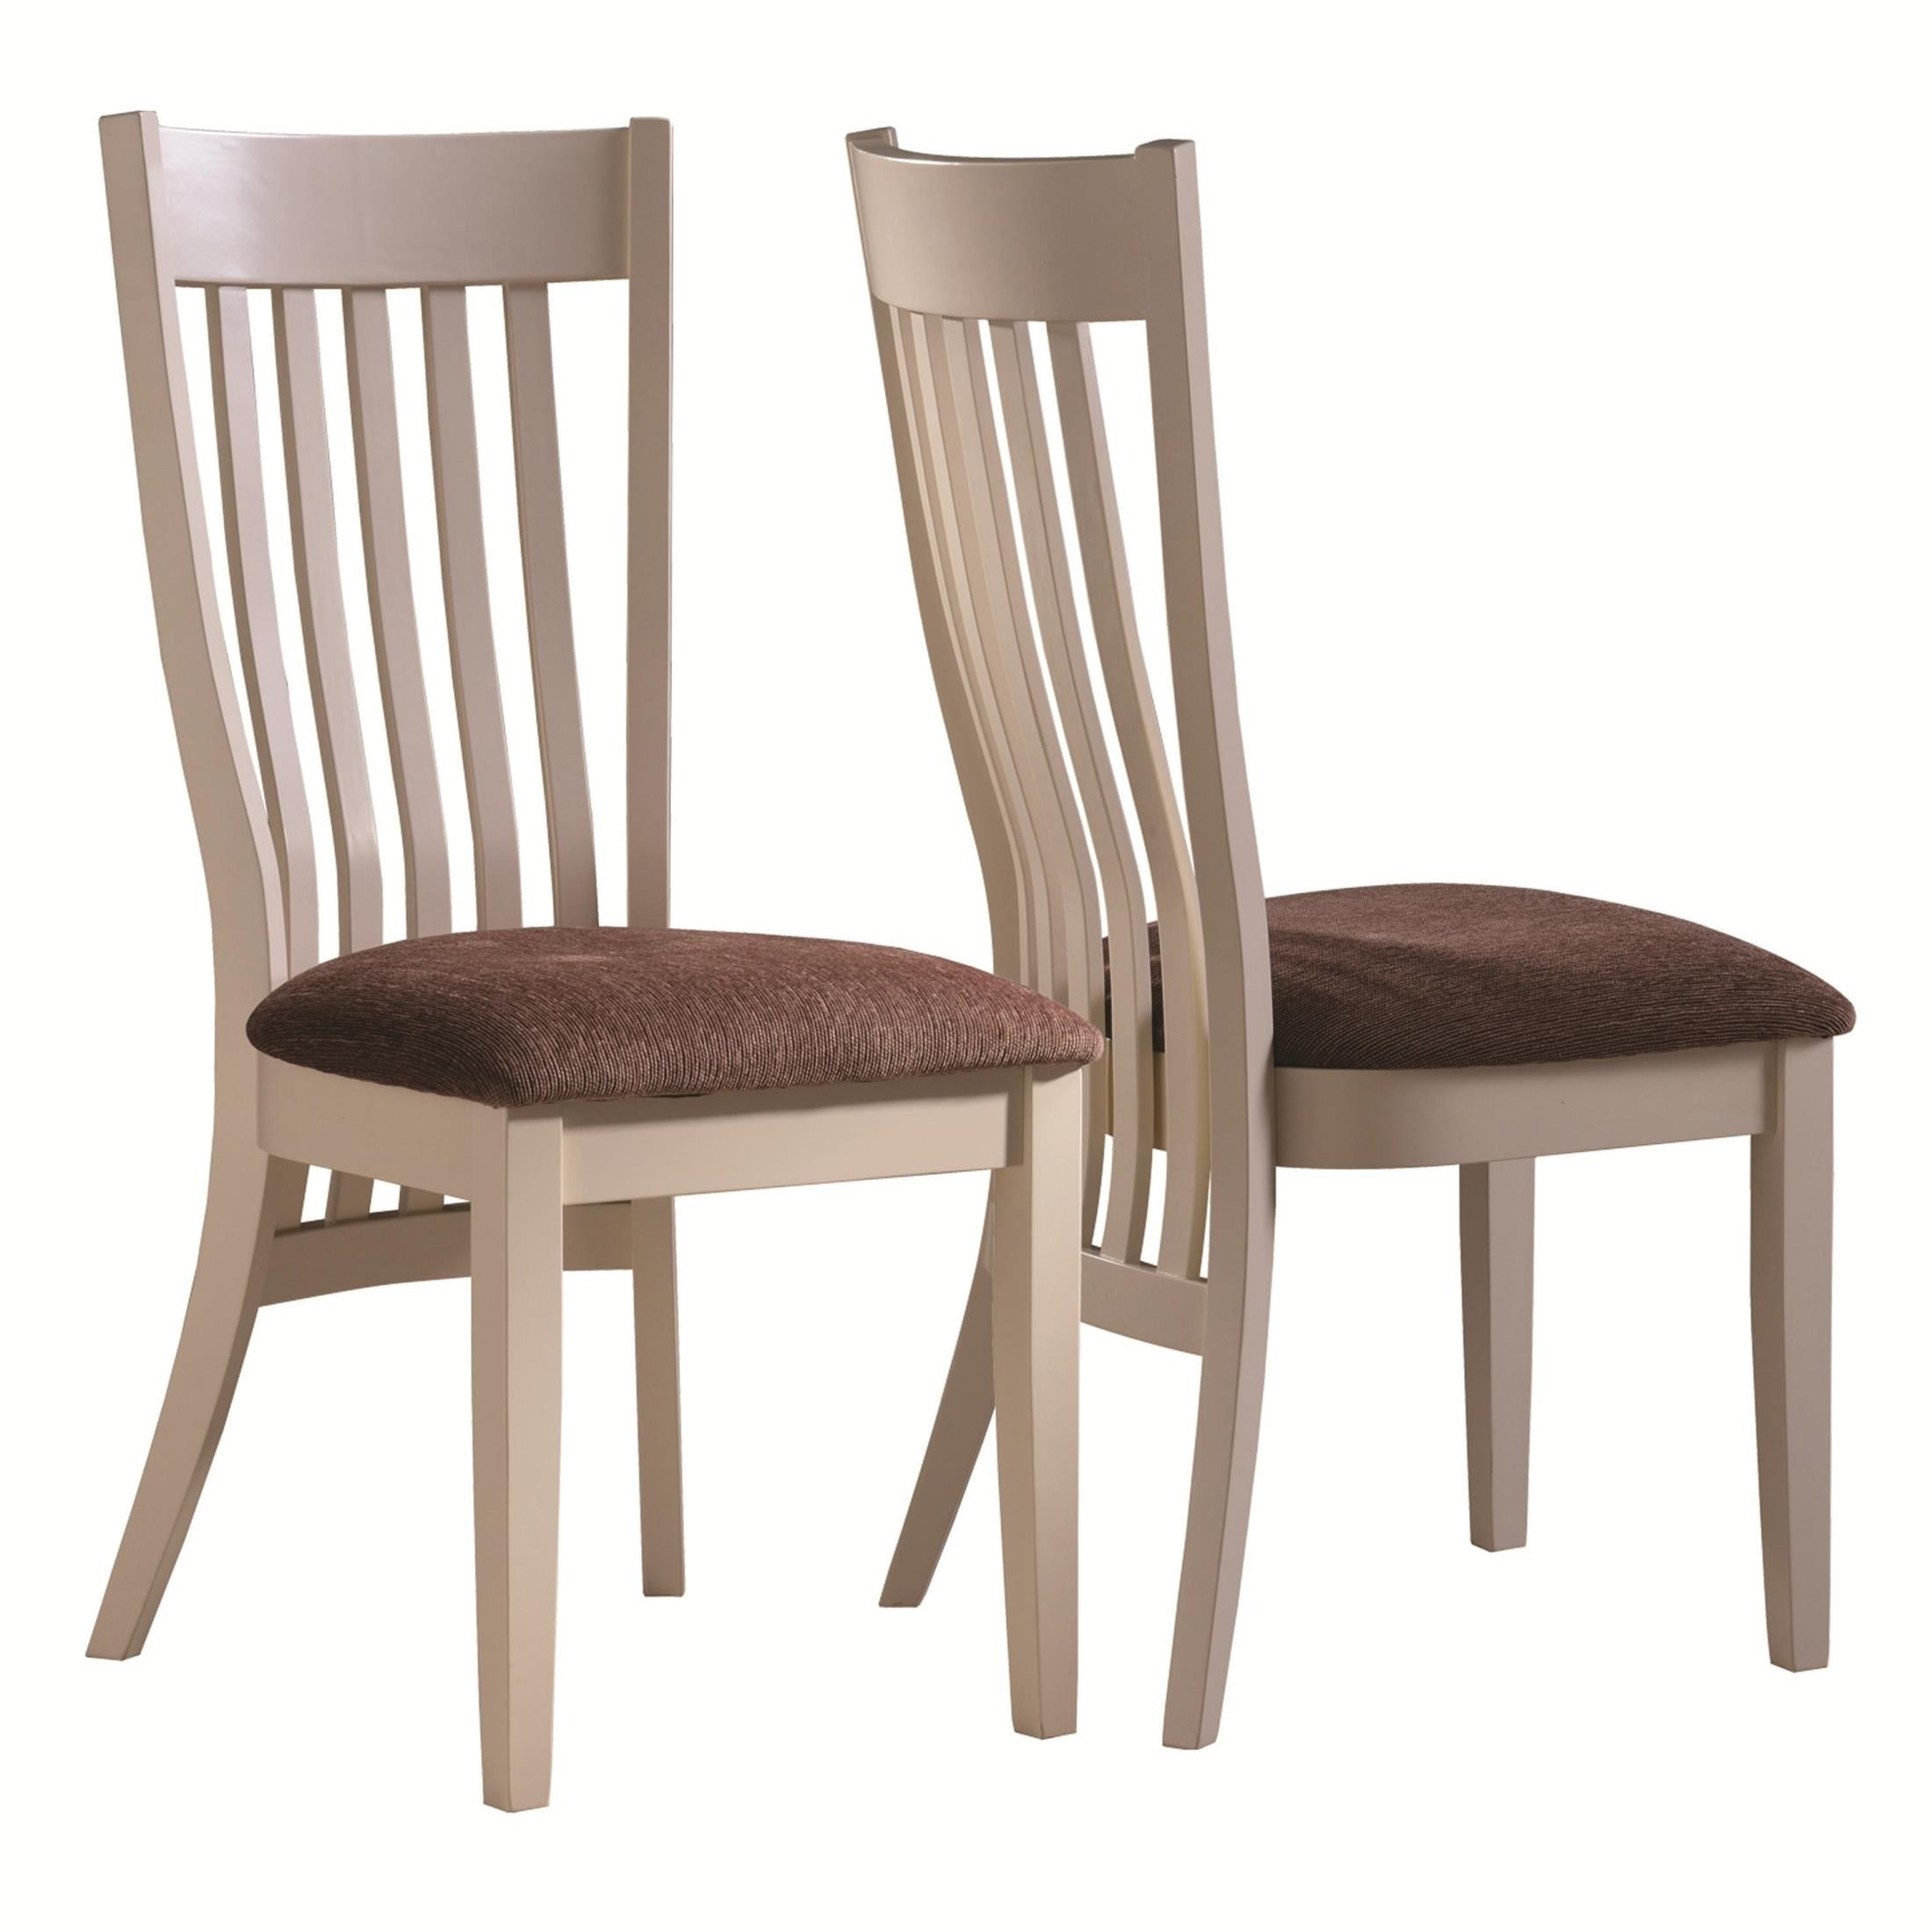 Naomi Side Chair Set Of 2, 104342, Coaster Furniture